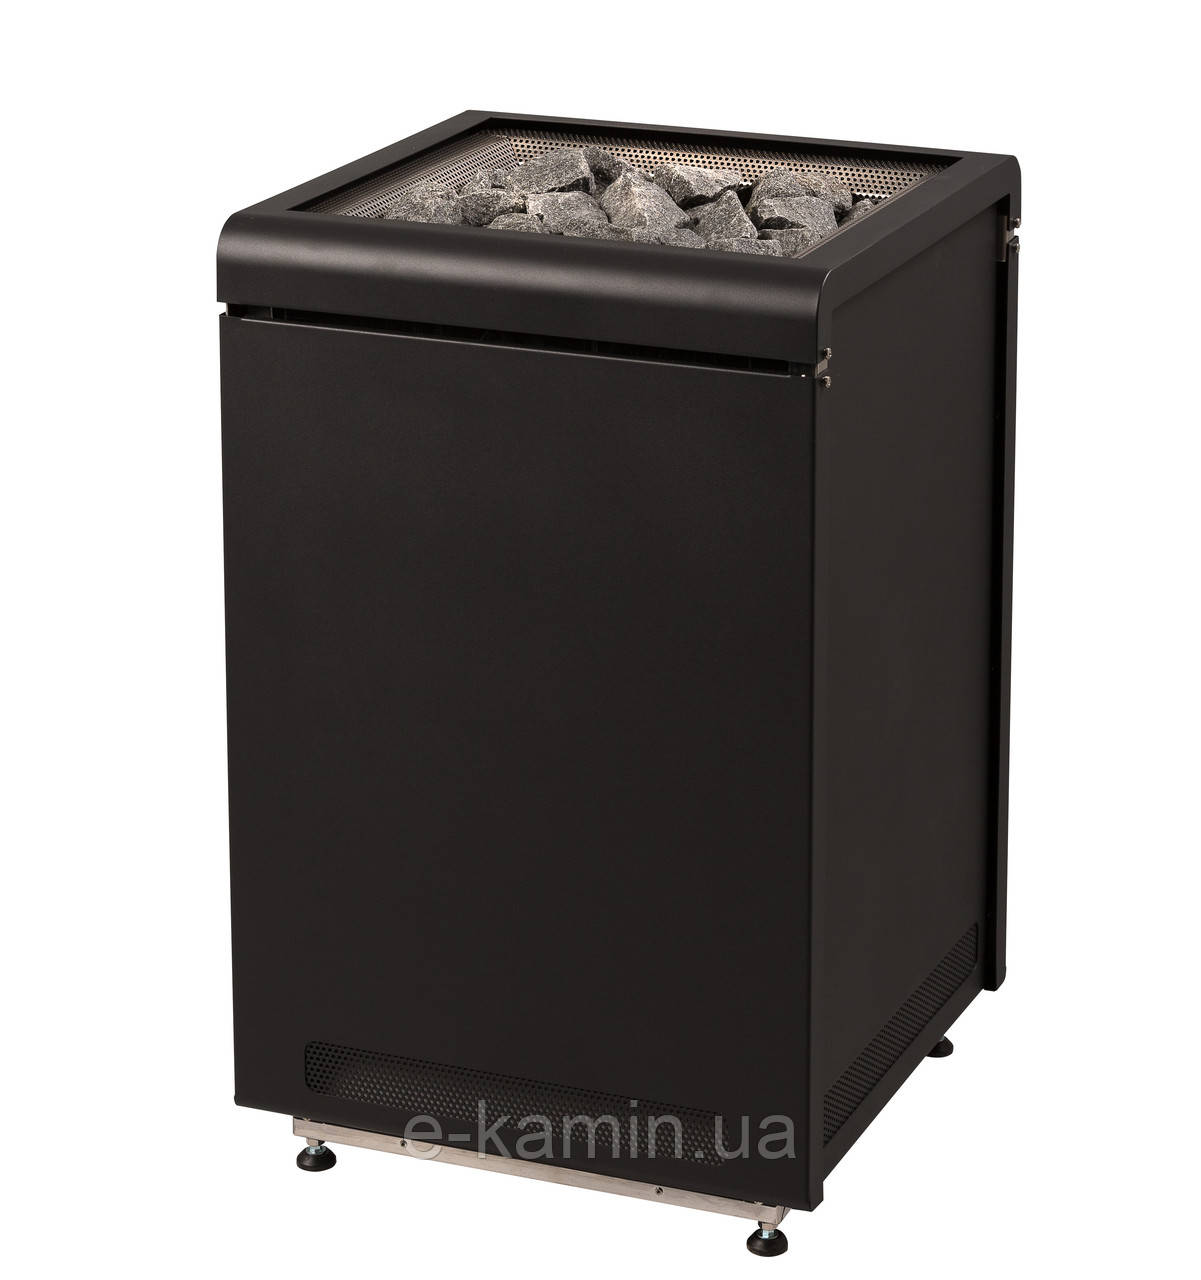 Электрокаменка Concept R black 9 кВт